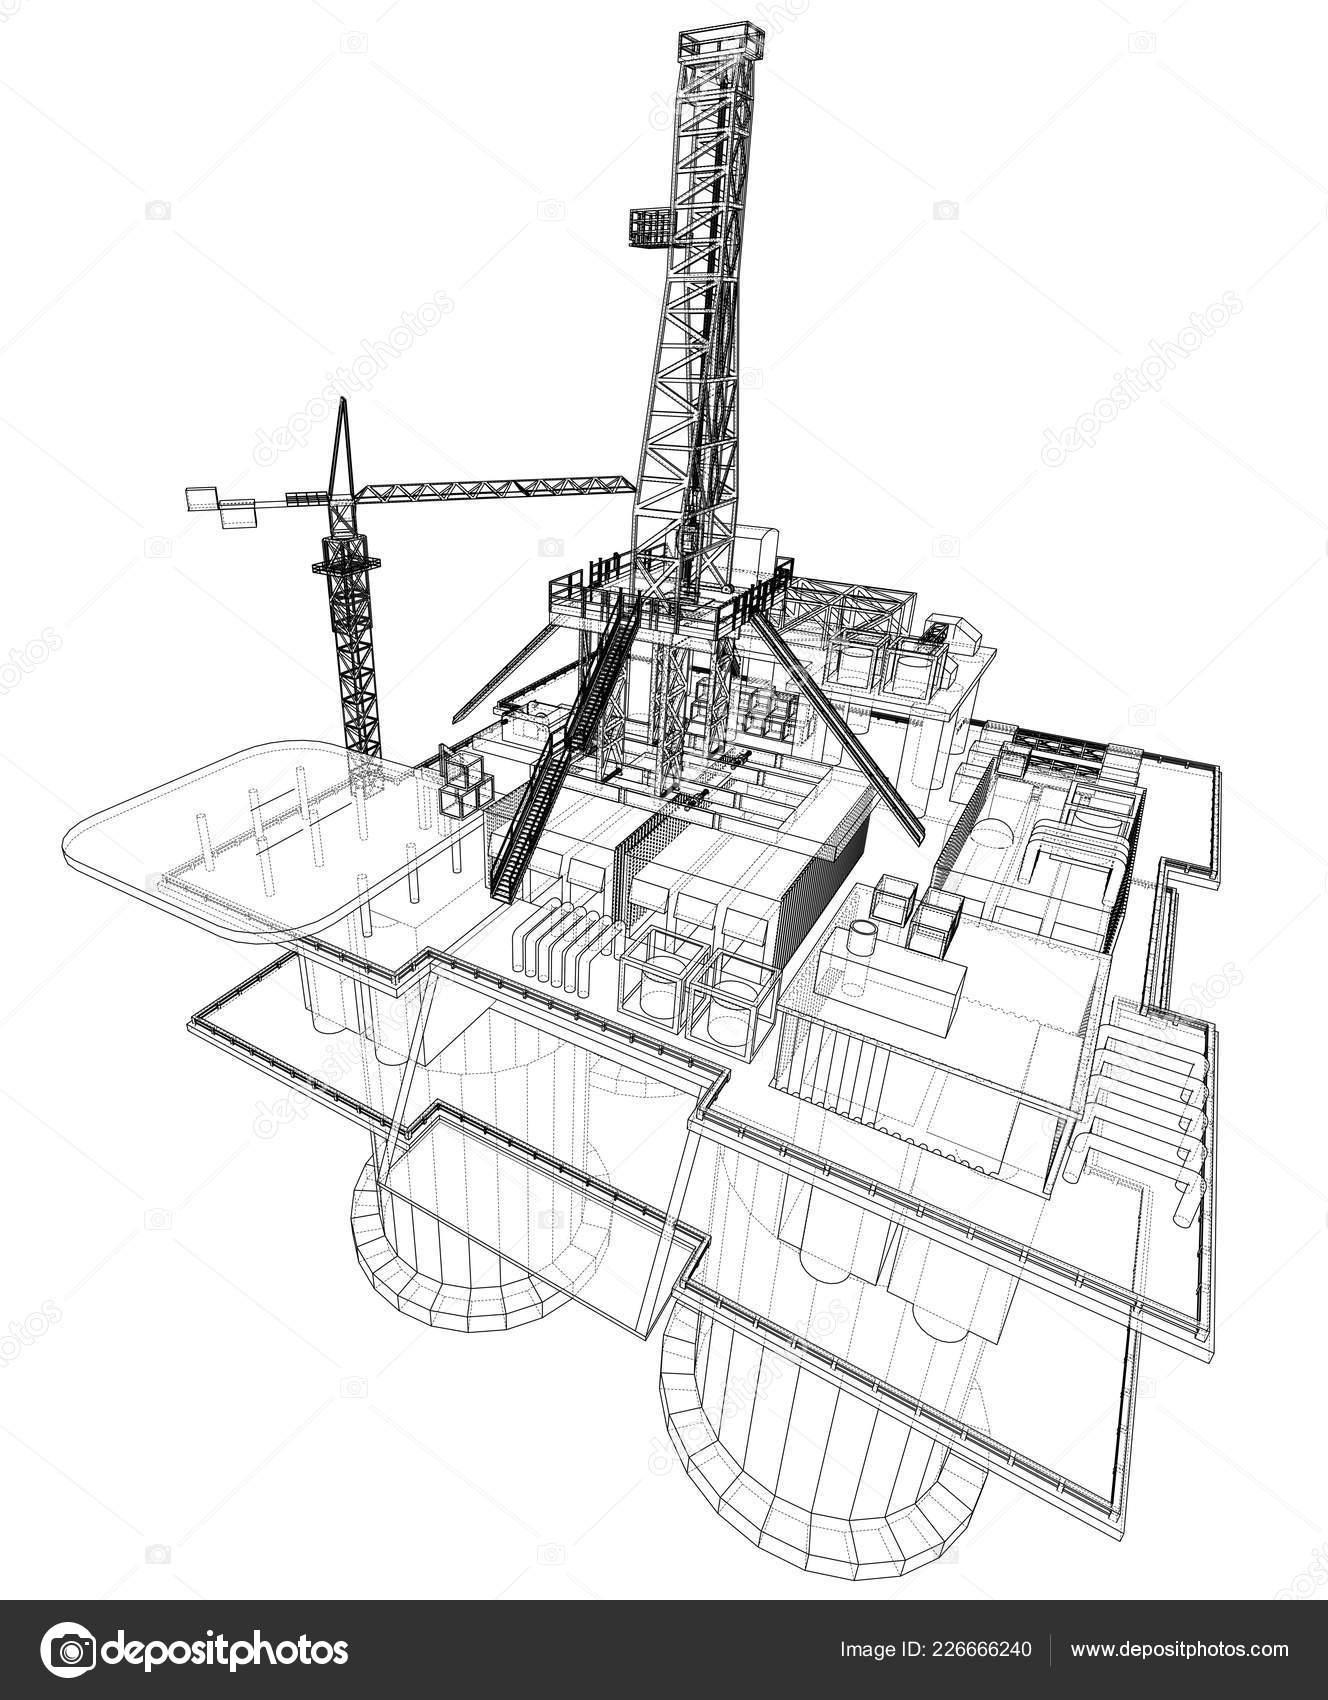 Offshore Oil Rig Drilling Platform Concept Vector